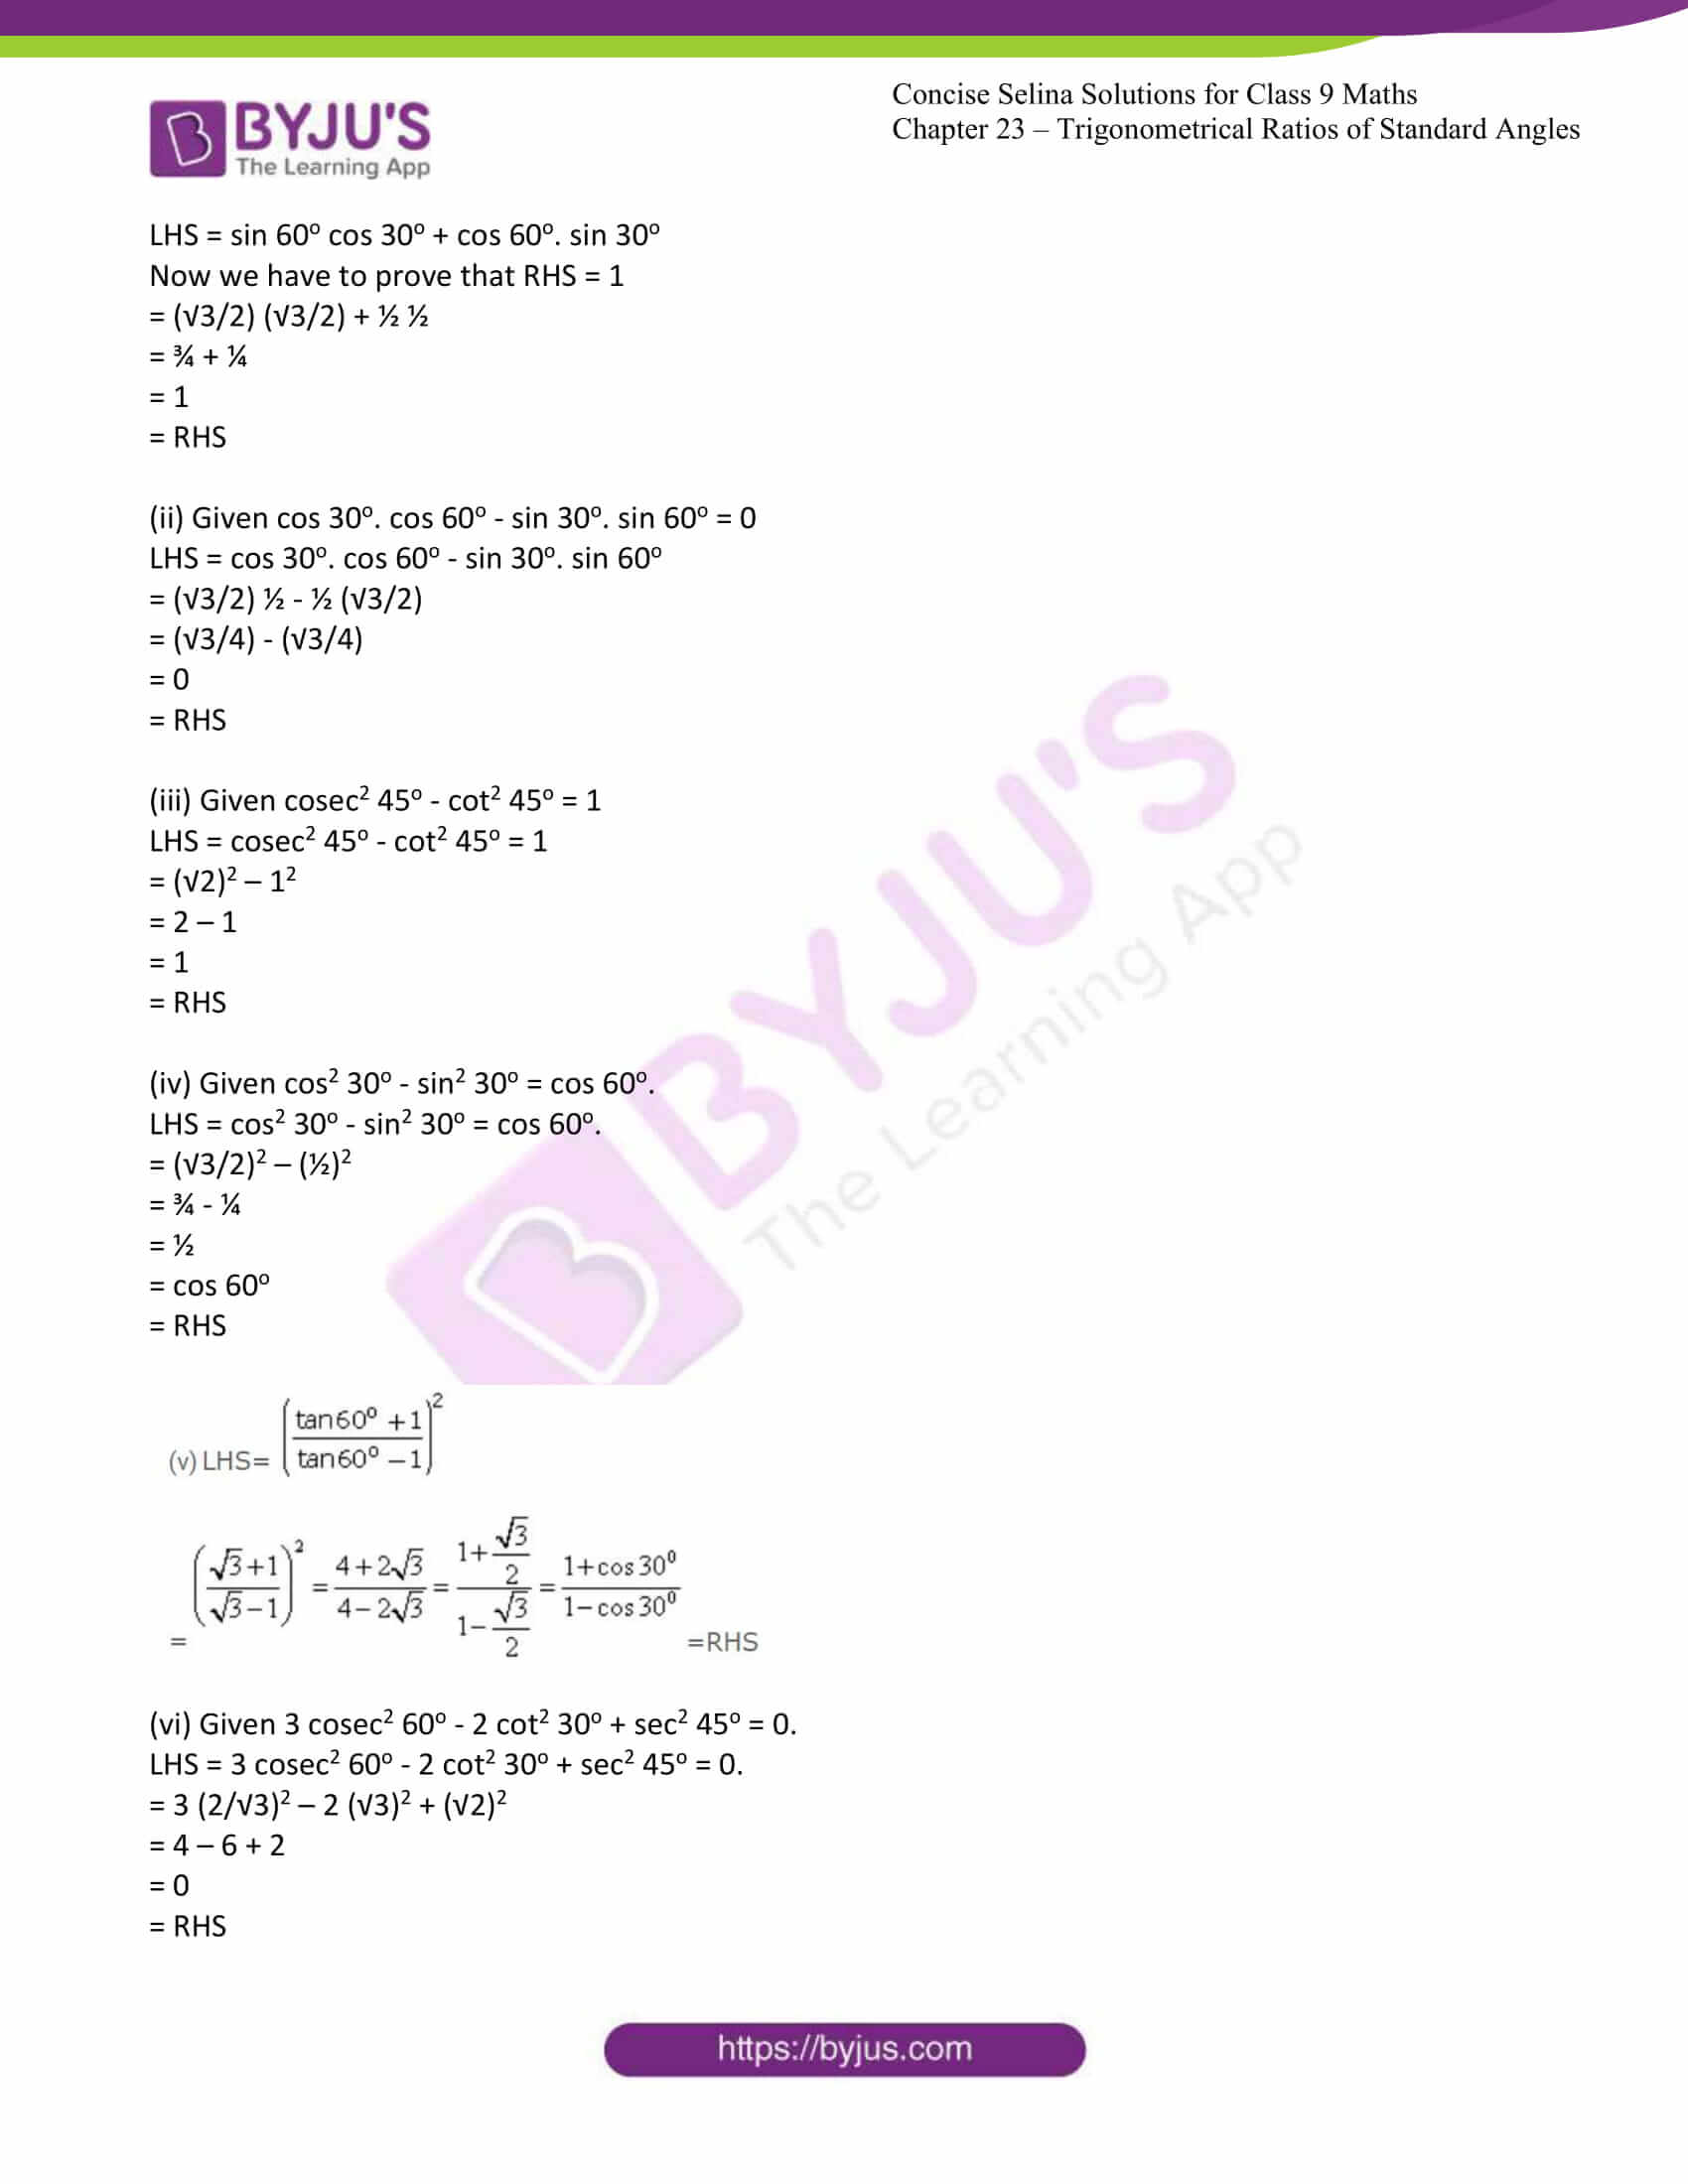 icse class 9 jun7 maths selina solutions chapter 23 trigonometrical ratios of standard angles 03